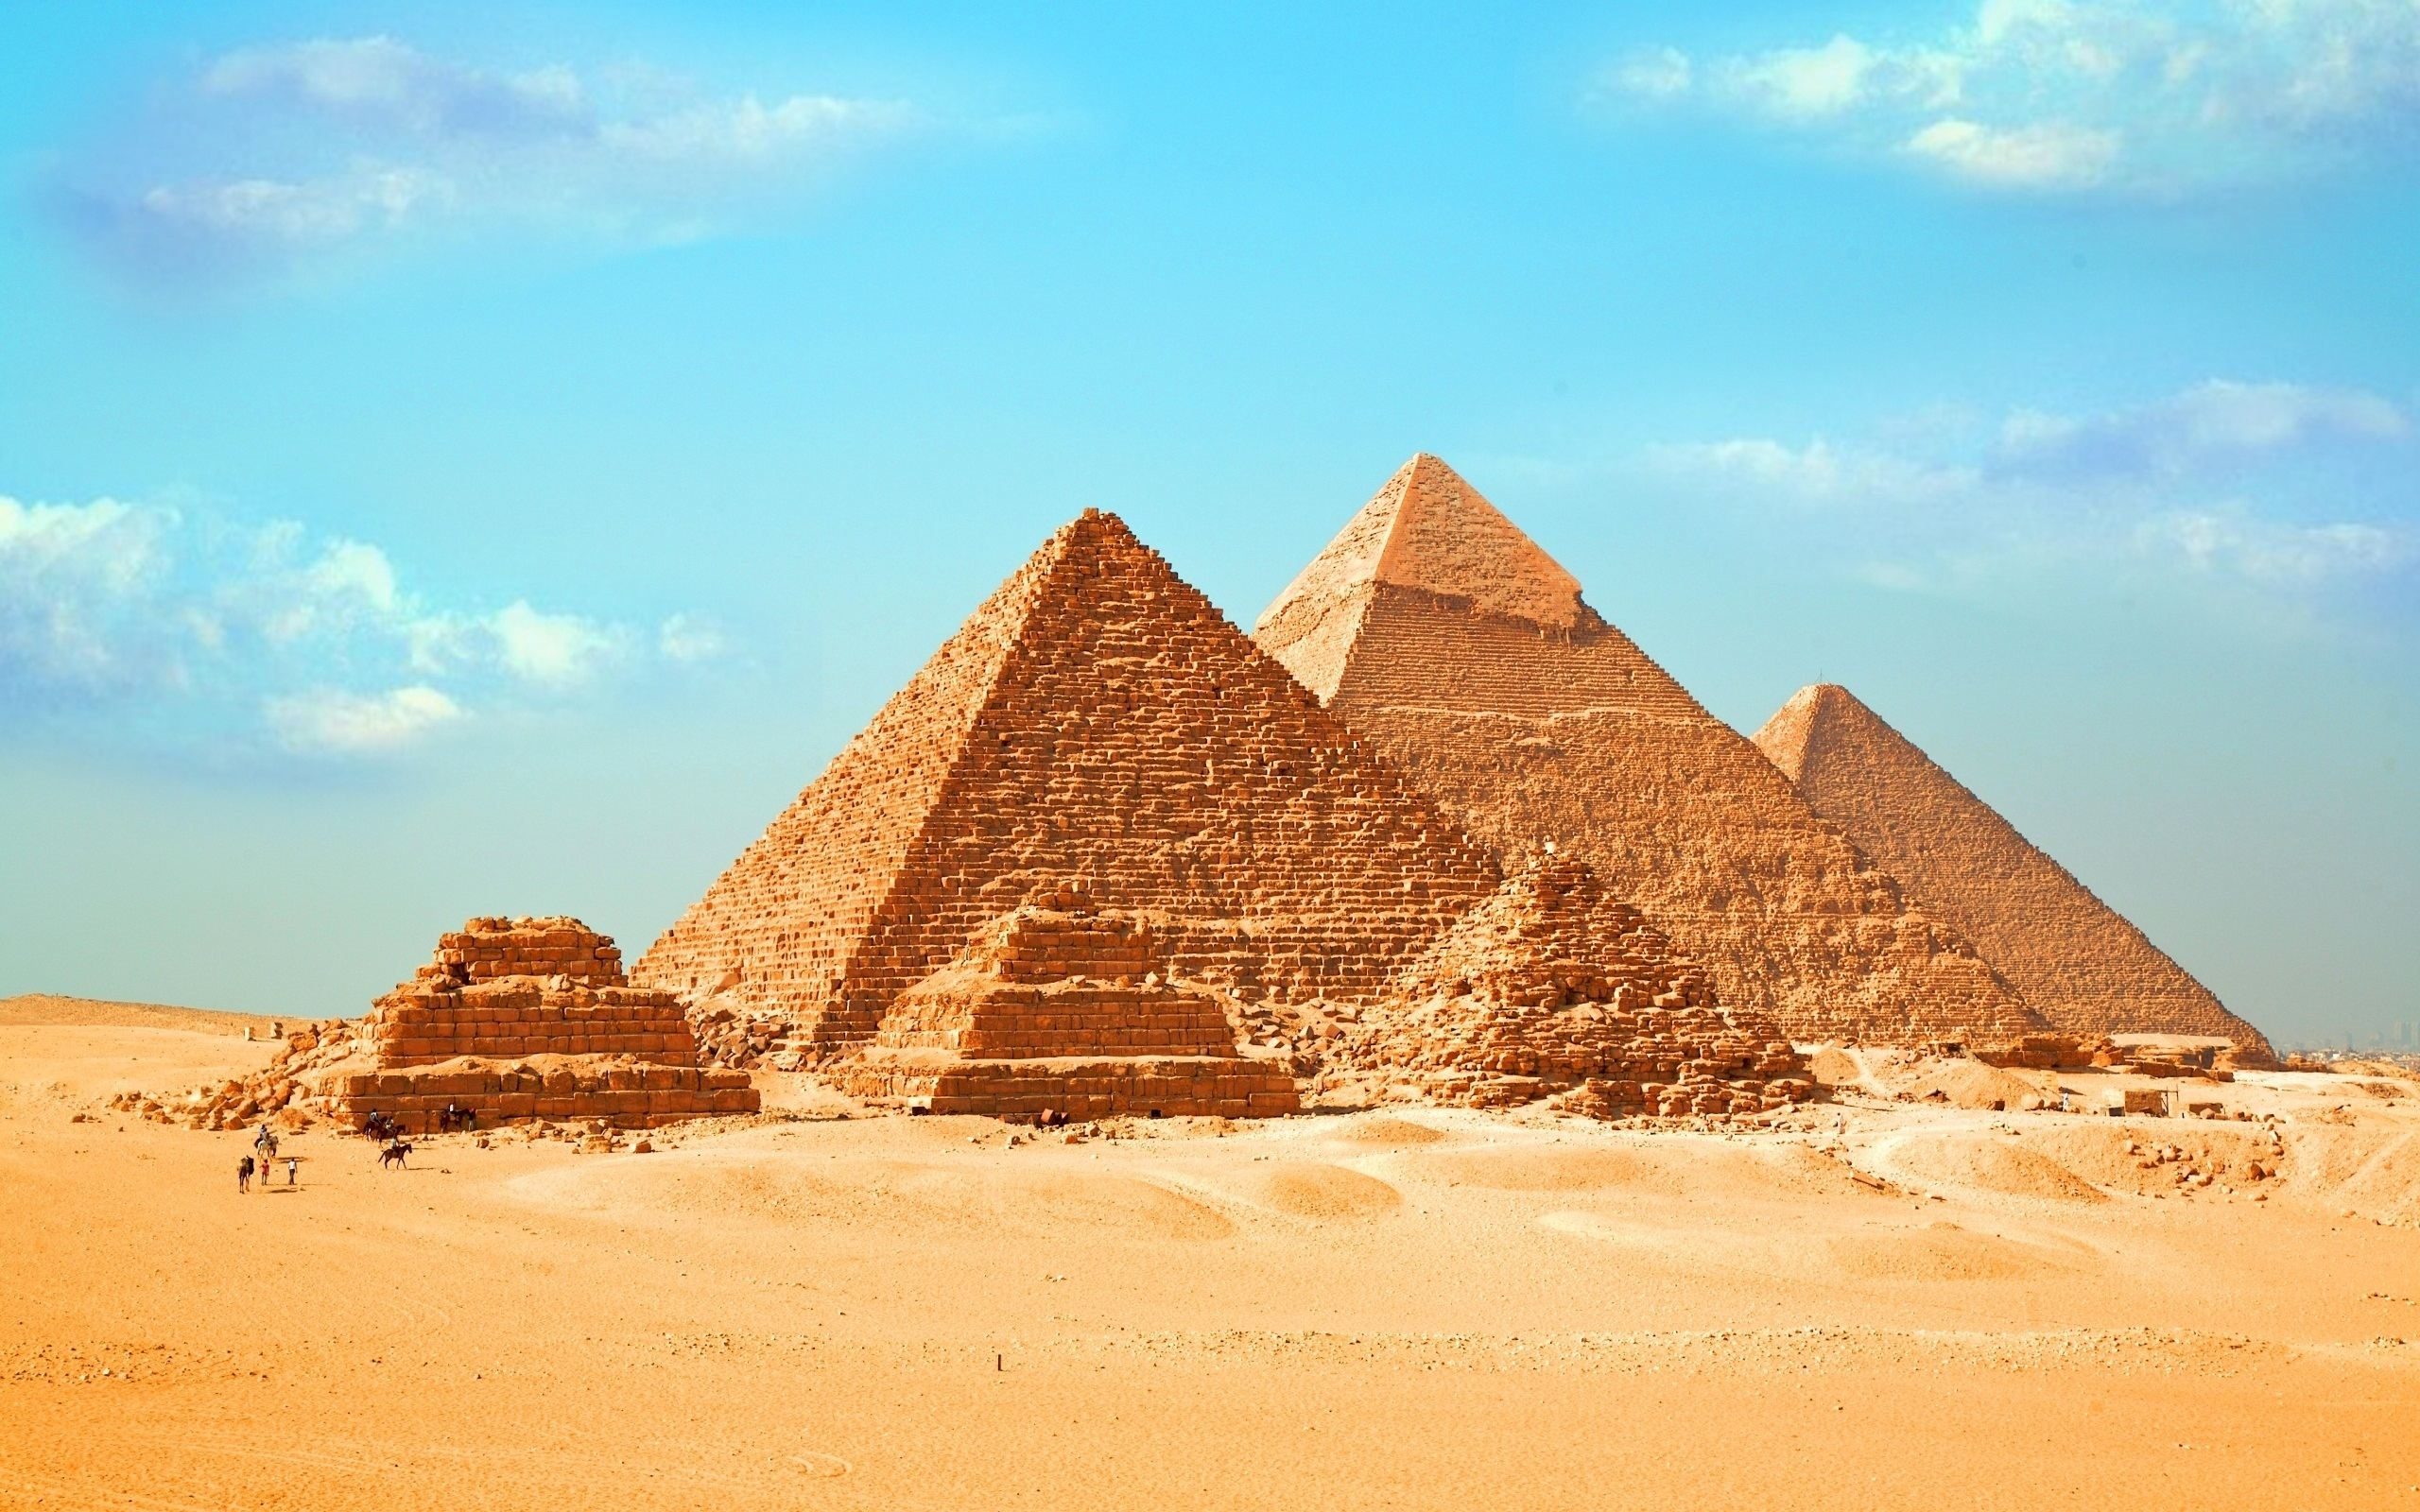 egypt images